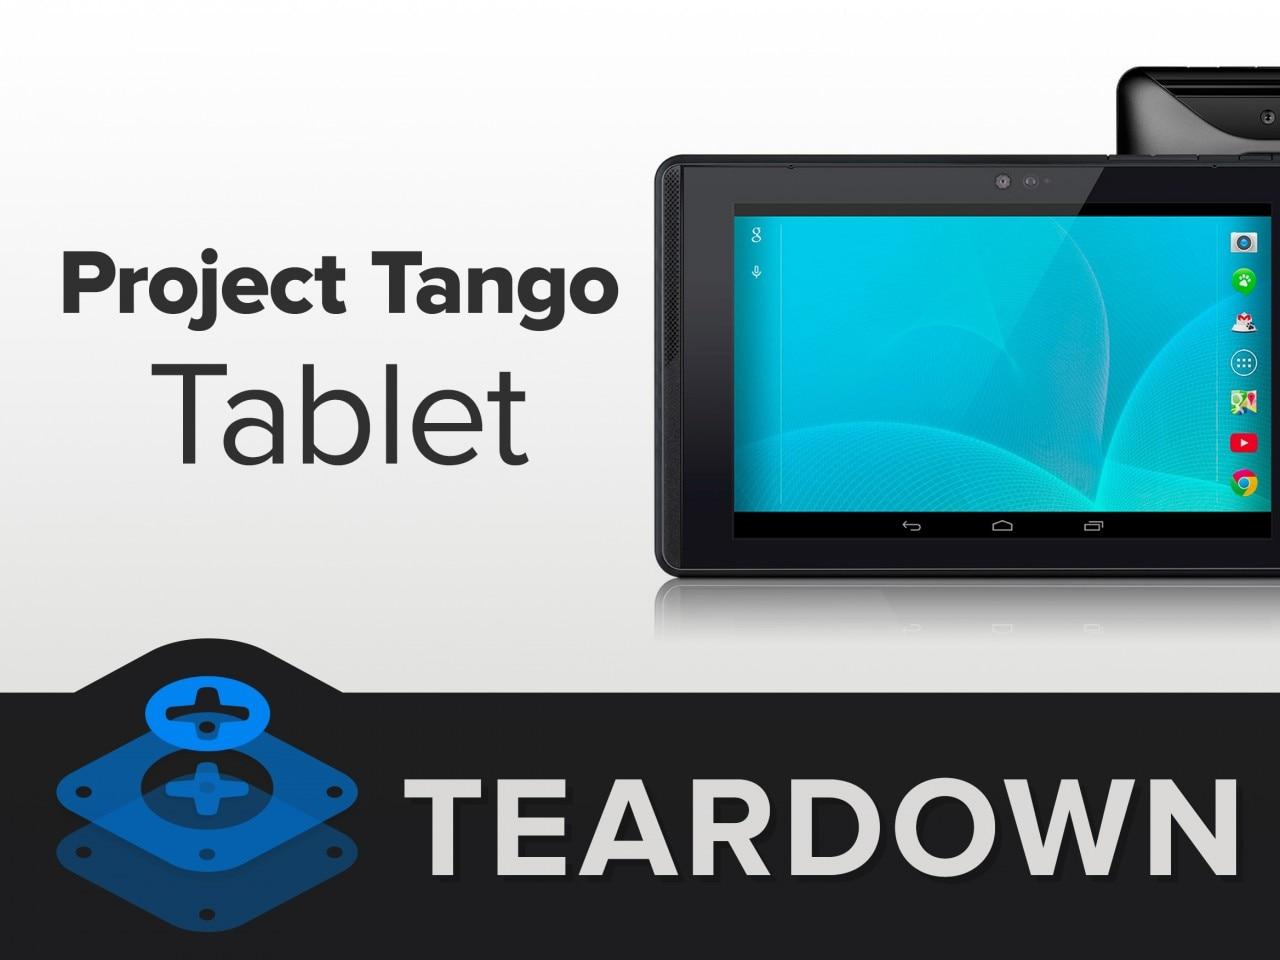 project tango teardown